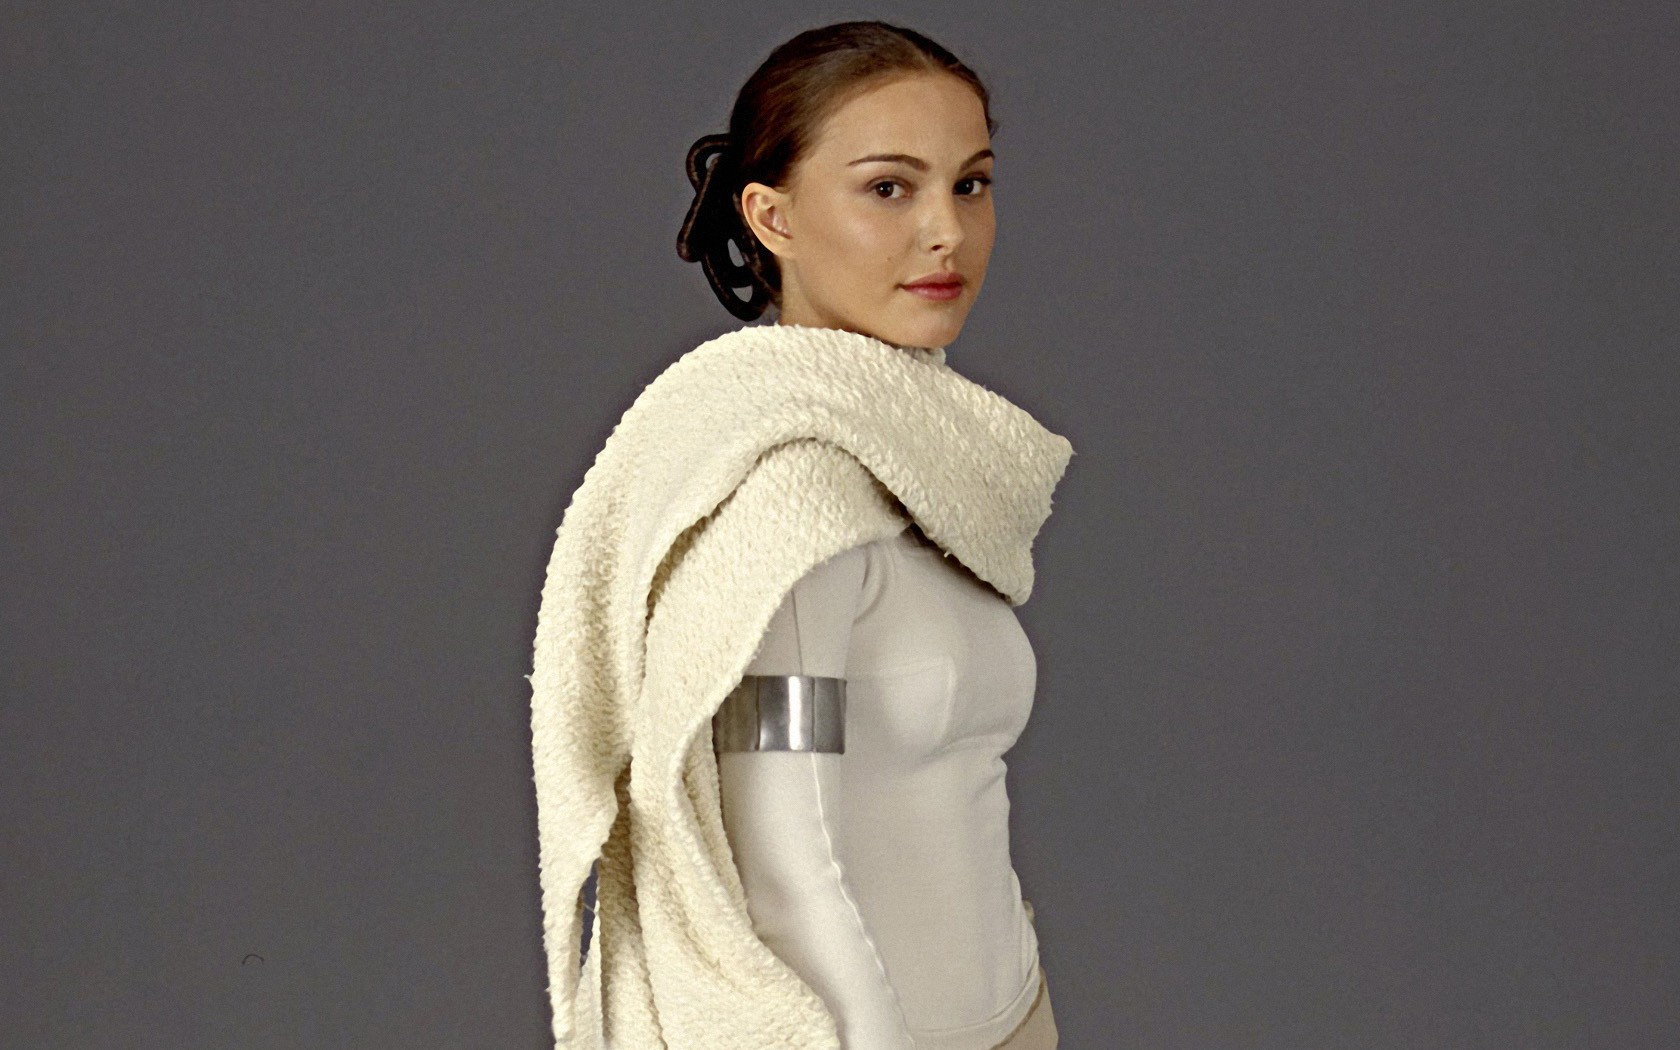 Natalie Portman Padmé Amidala Star Wars- Wallpaper 1680x1050